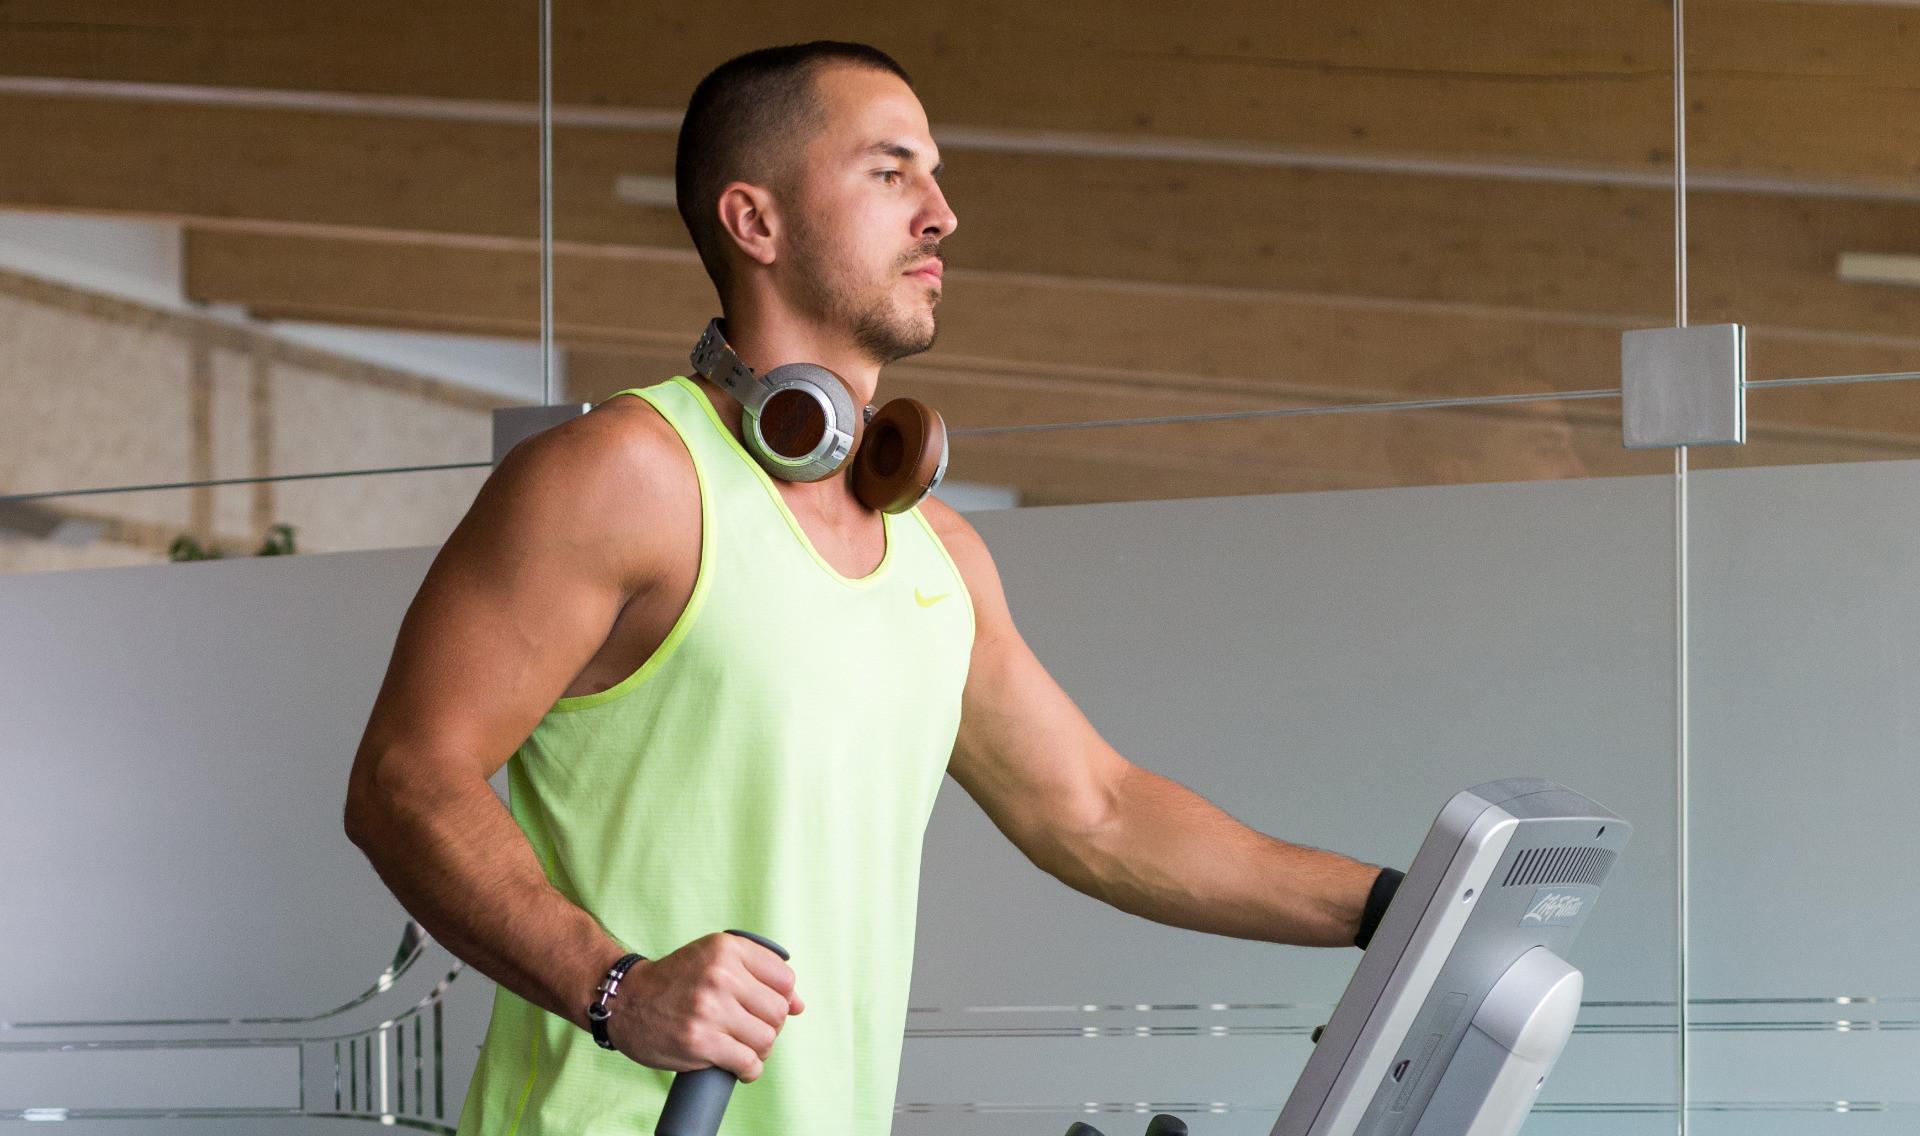 Aparate de fitness